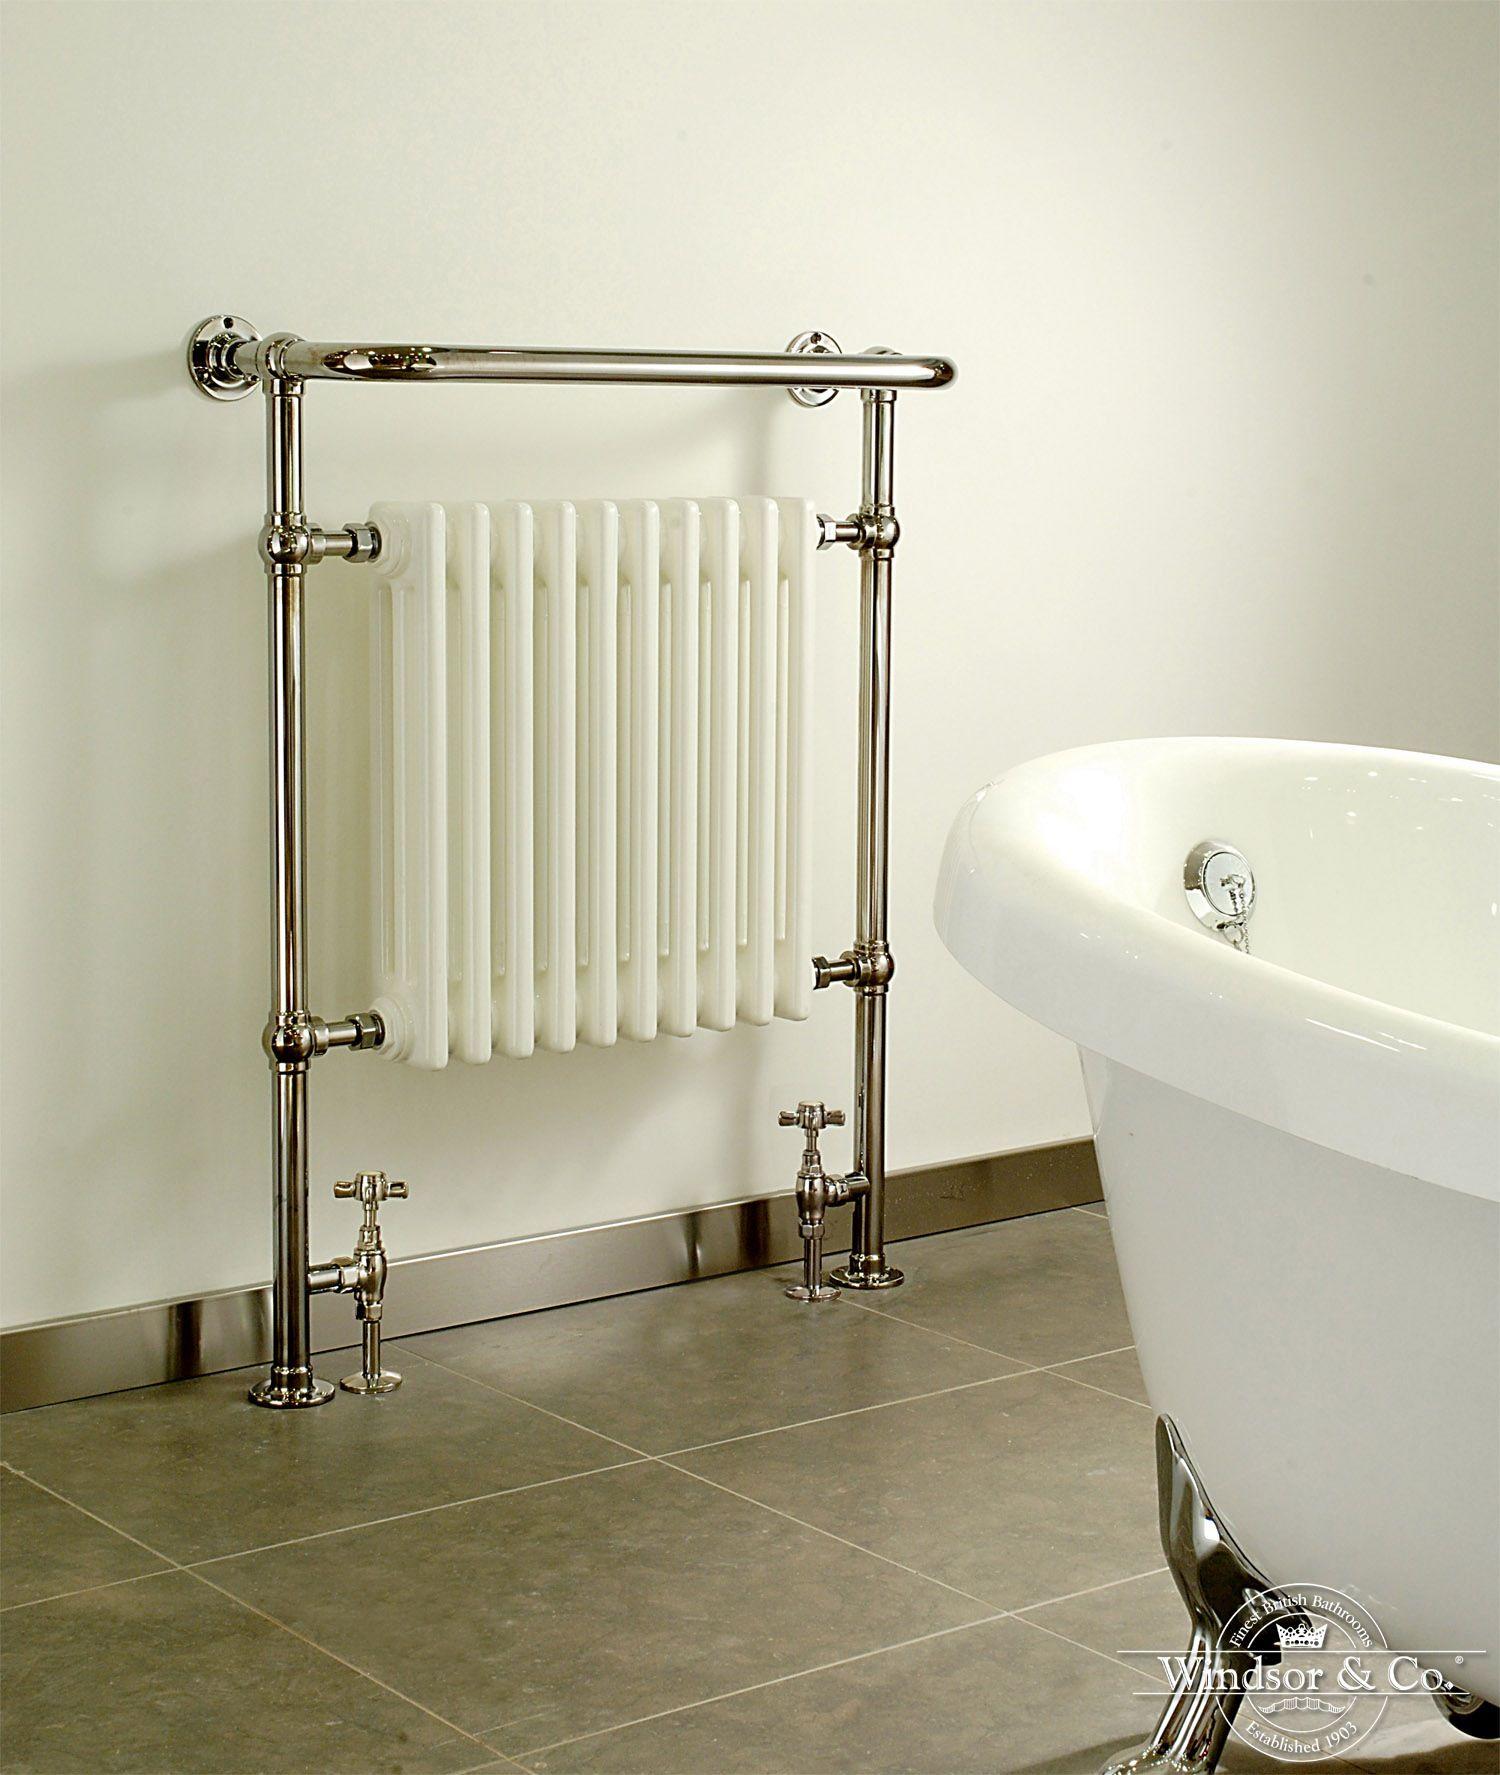 Windsor handdoek radiator Regency   Badkamer   Pinterest   Radiators ...